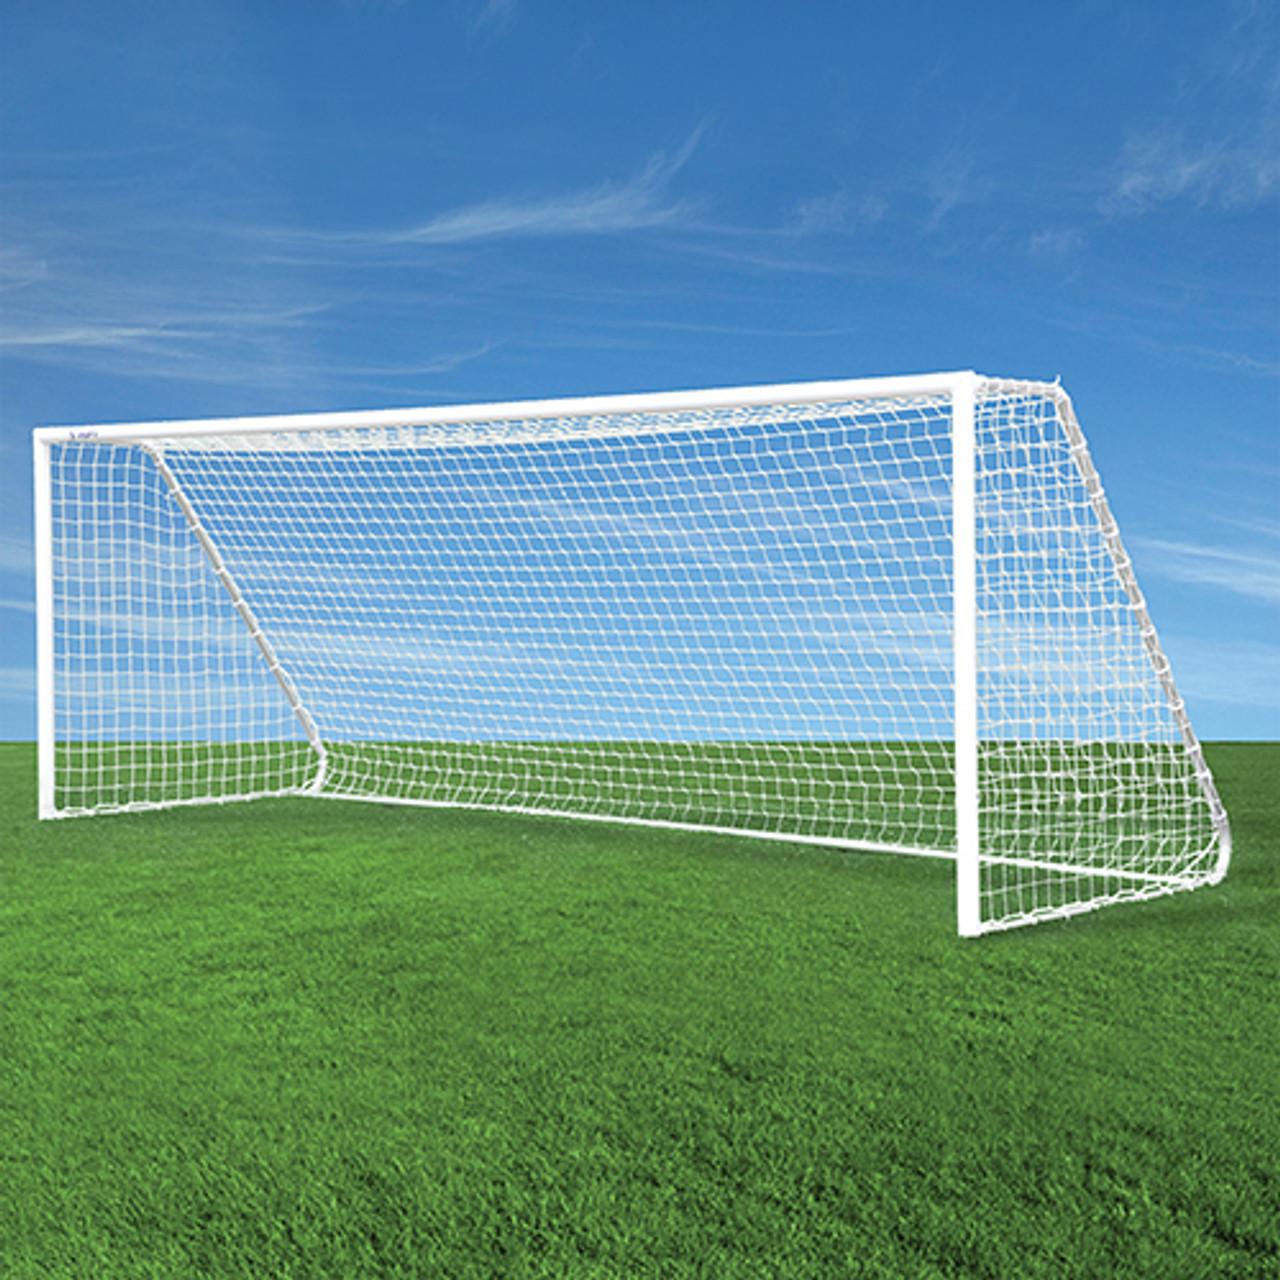 JayPro 8x24 full size regulation soccer goals